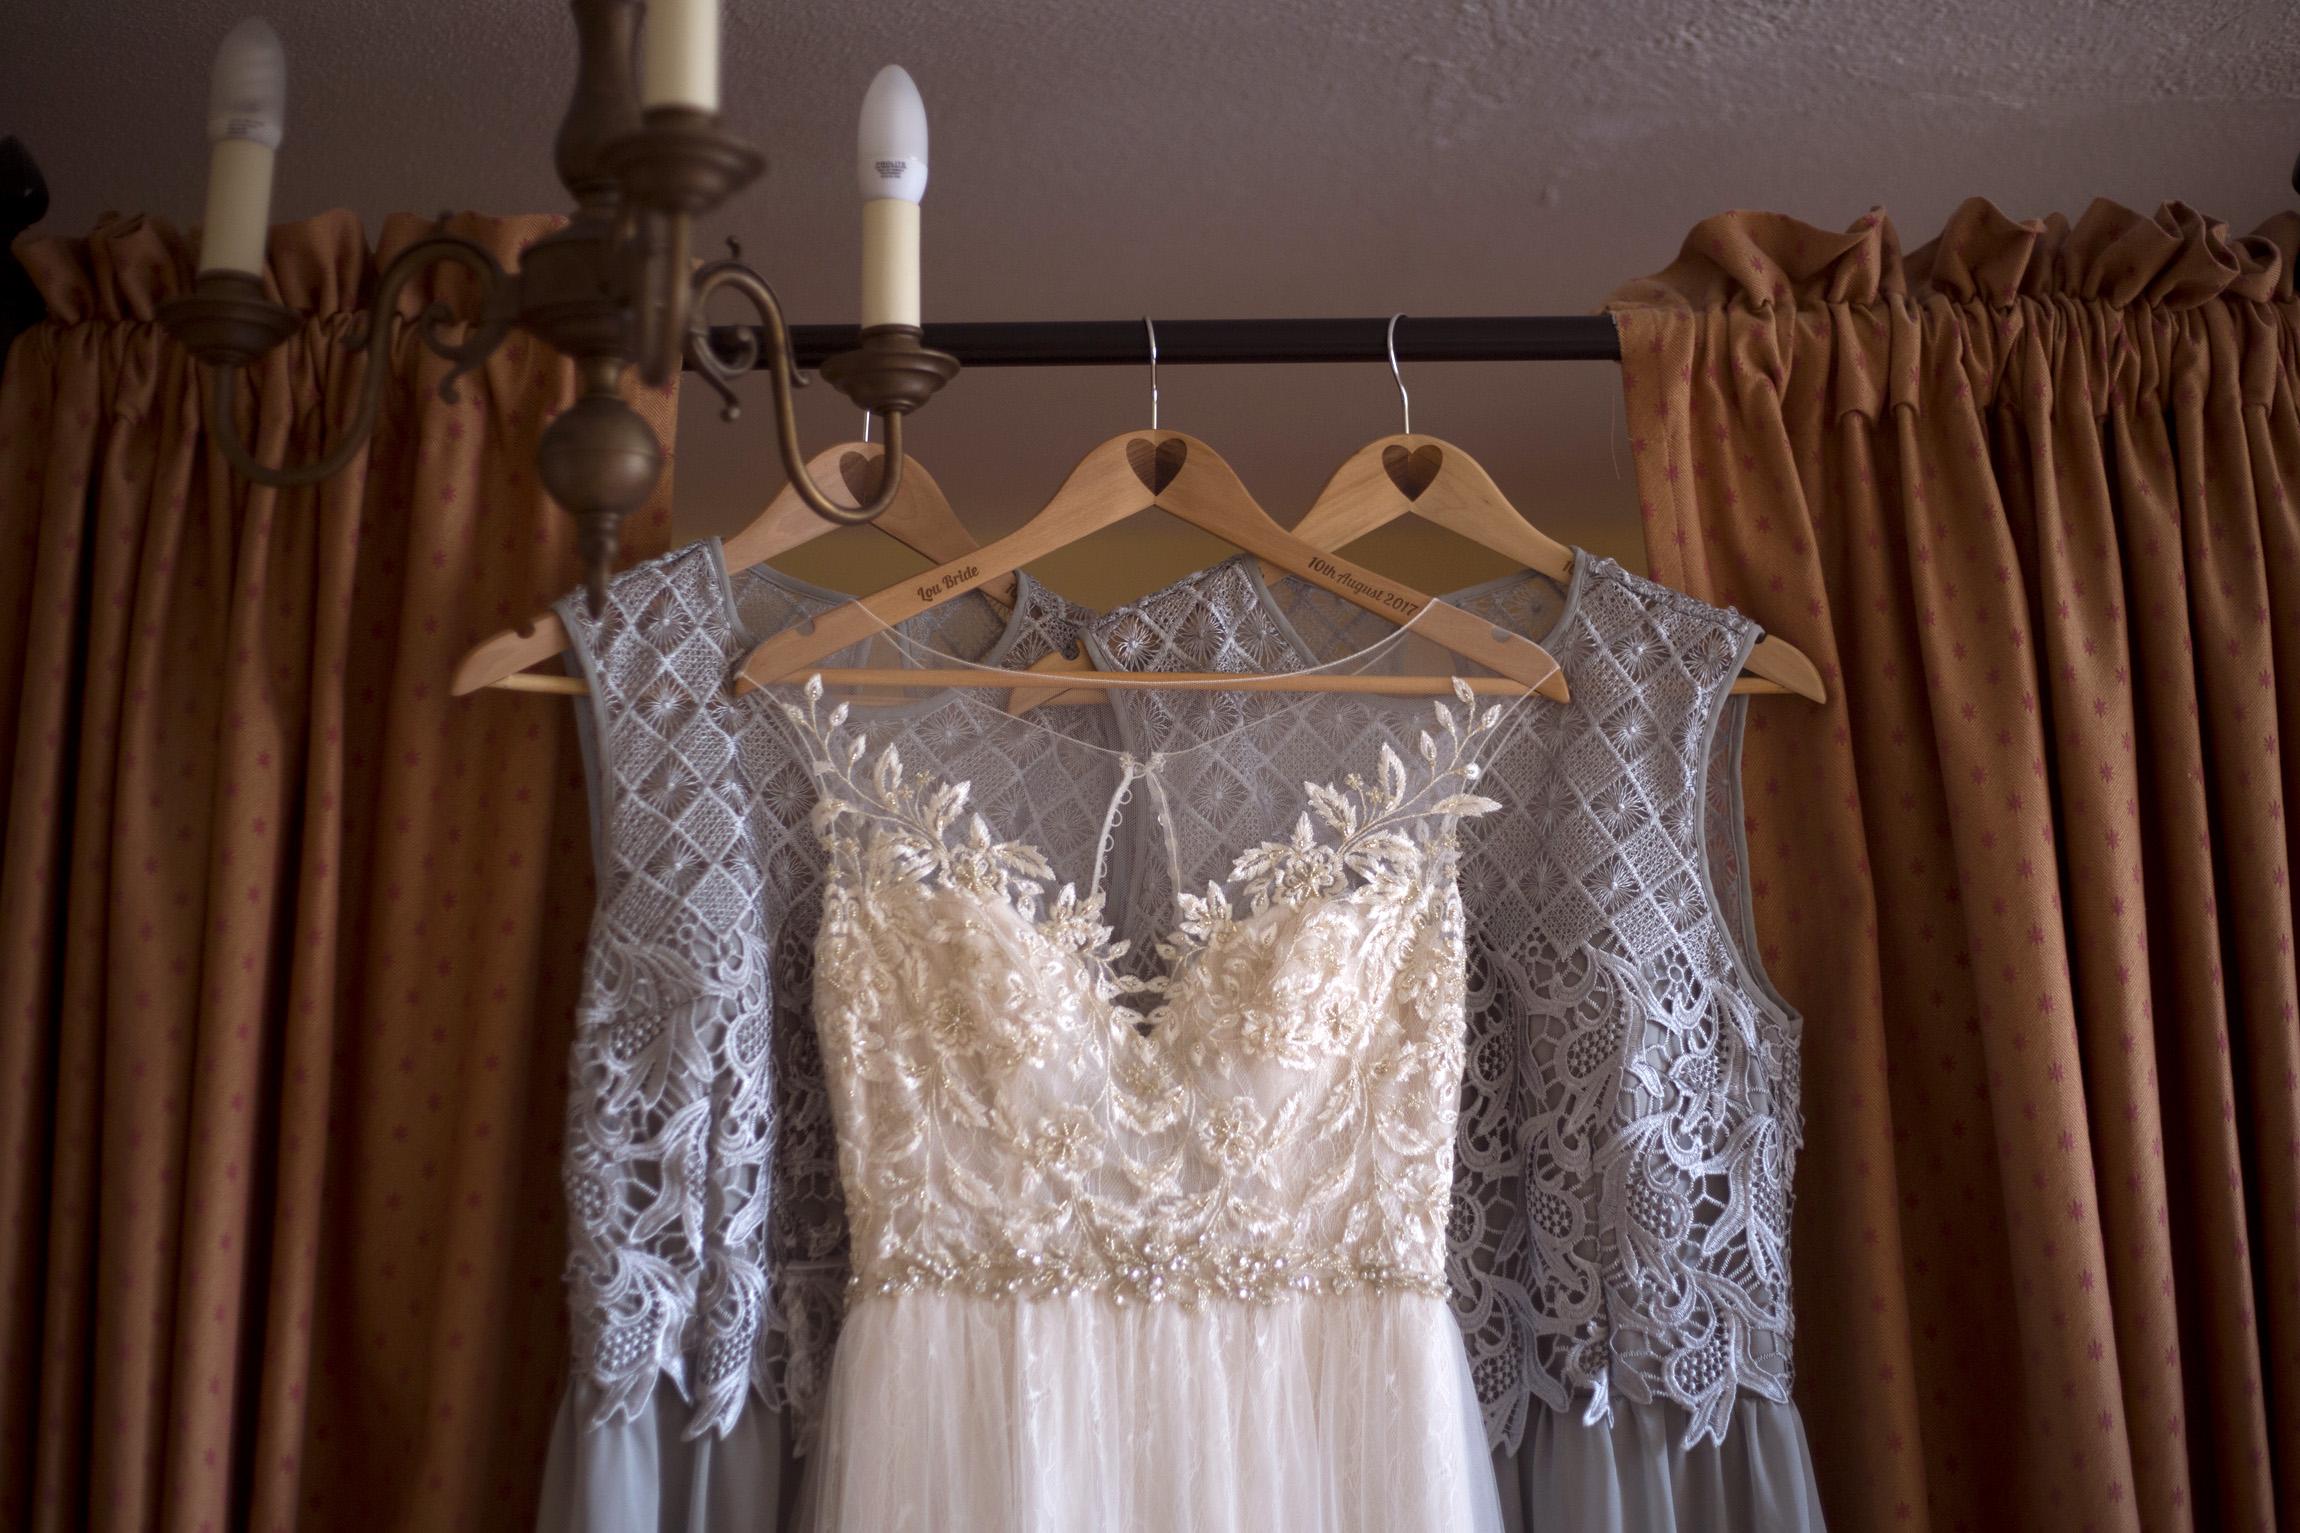 Brides dress and bridesmaids dresses Cripps barn outdoor wedding photographer